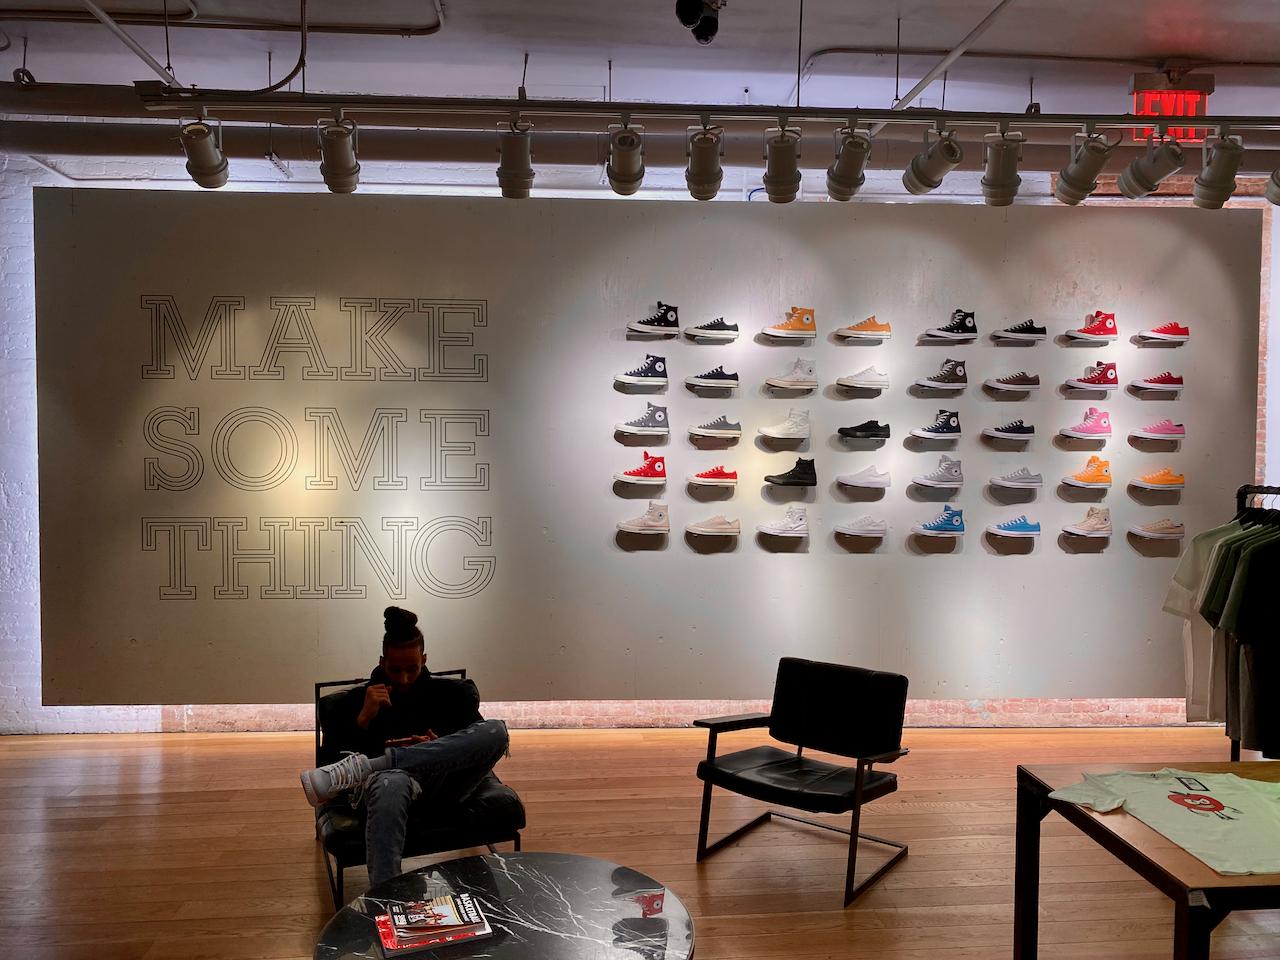 Converse SoHo shoe display